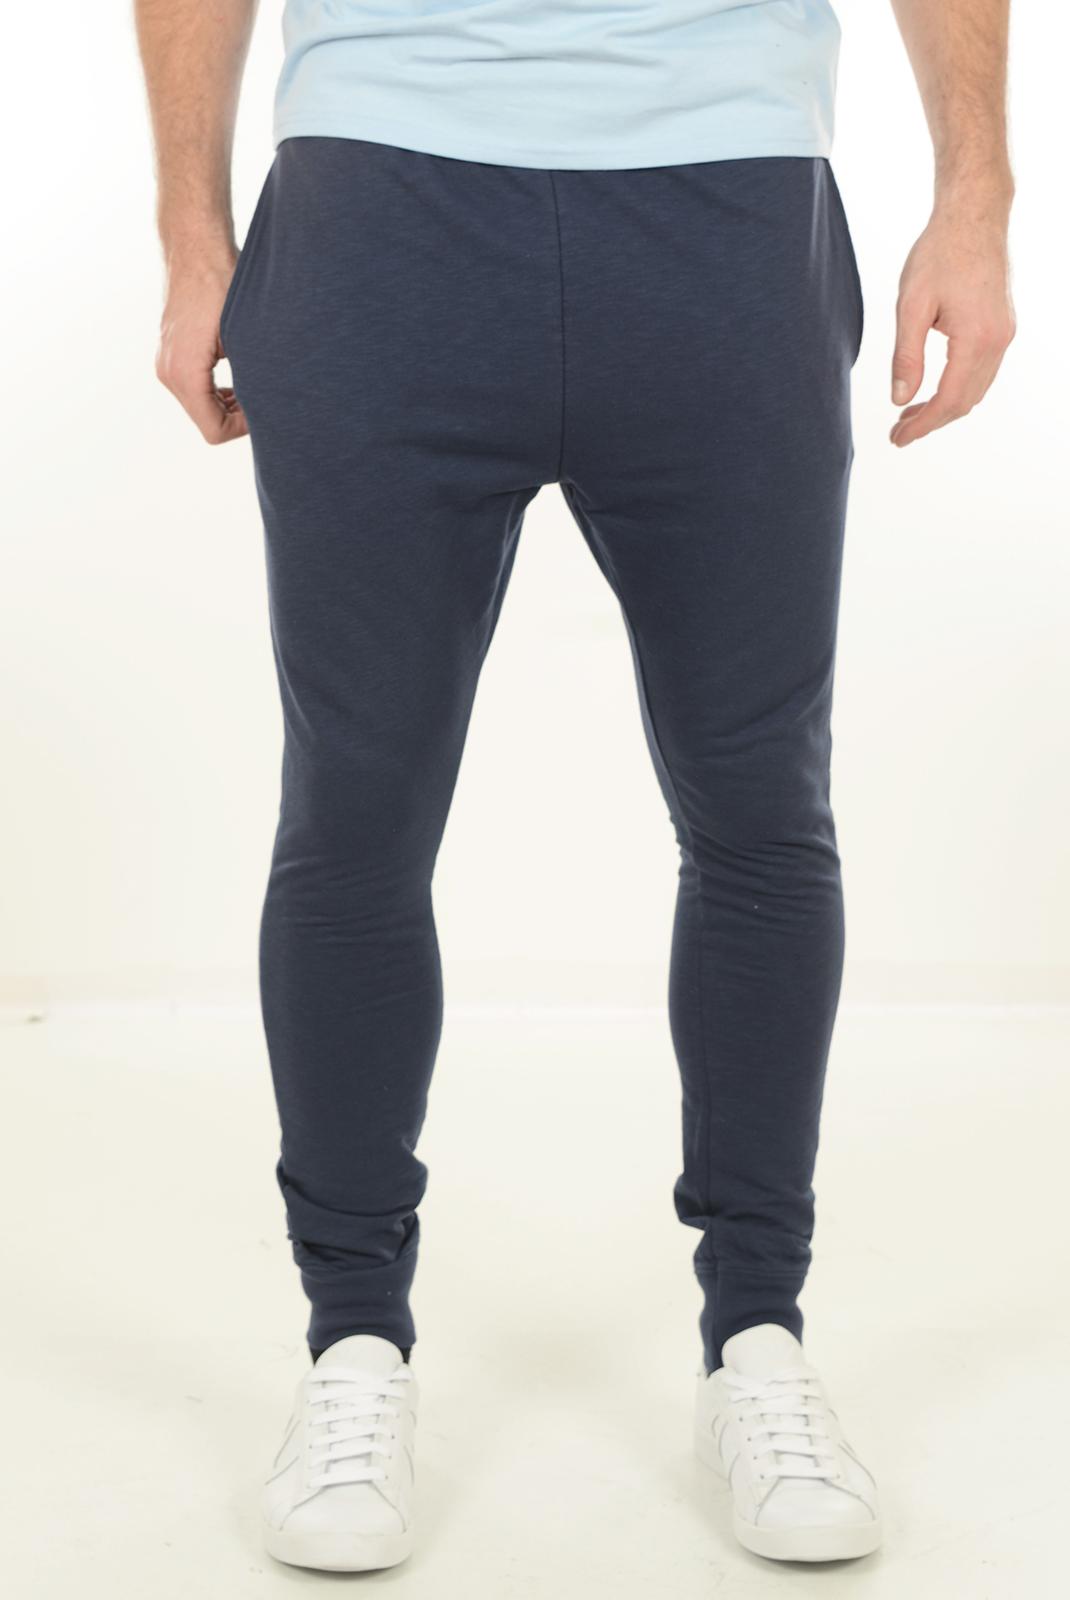 Pantalons sport/streetwear  Redskins COY MIDDLETON NAVY